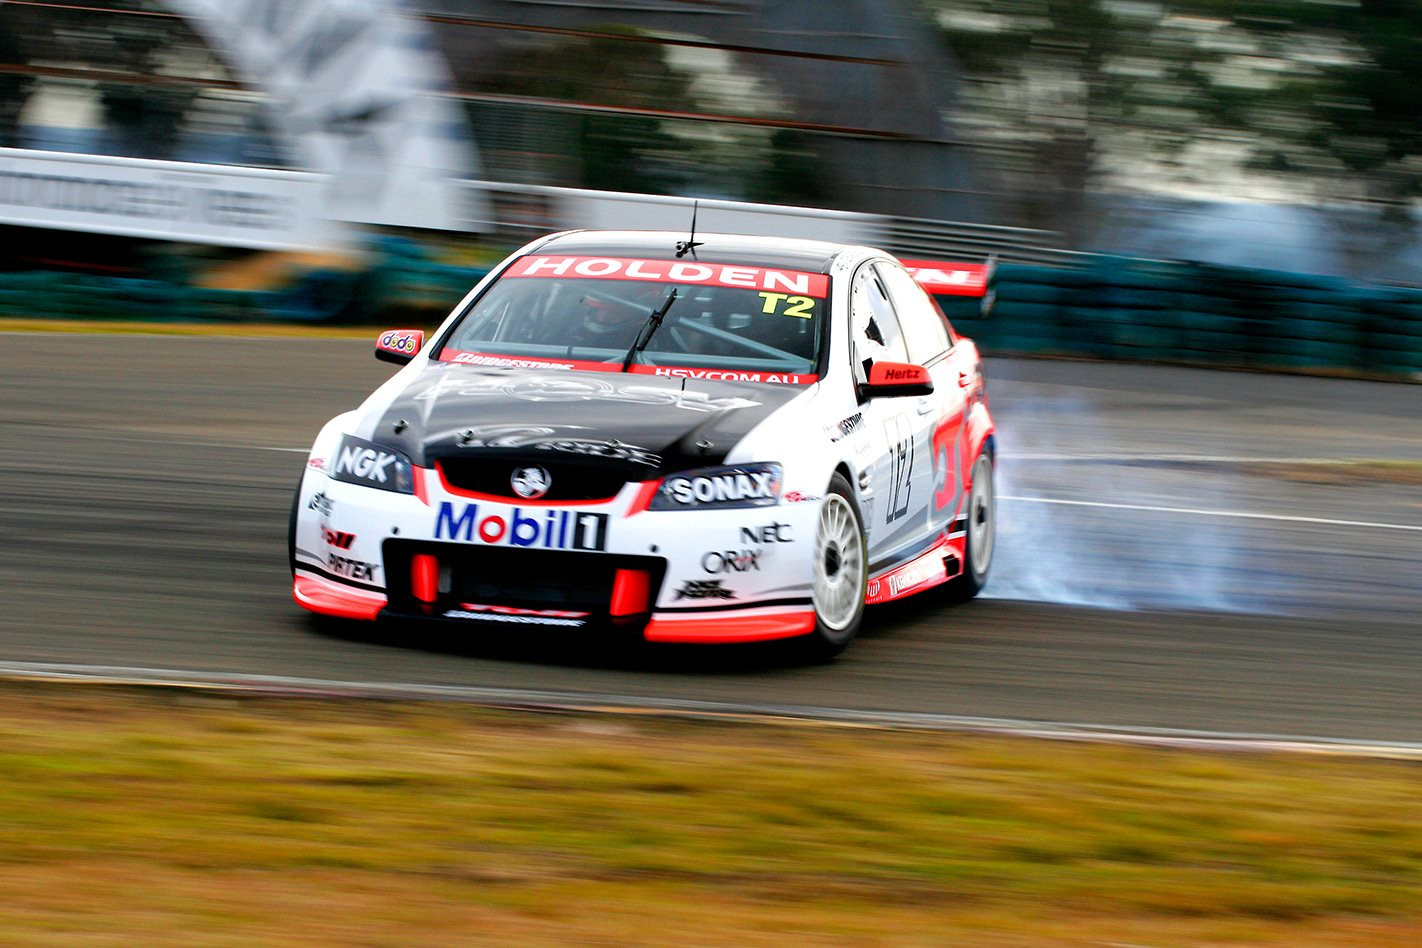 HSV-V8-Supercar-drifting.jpg